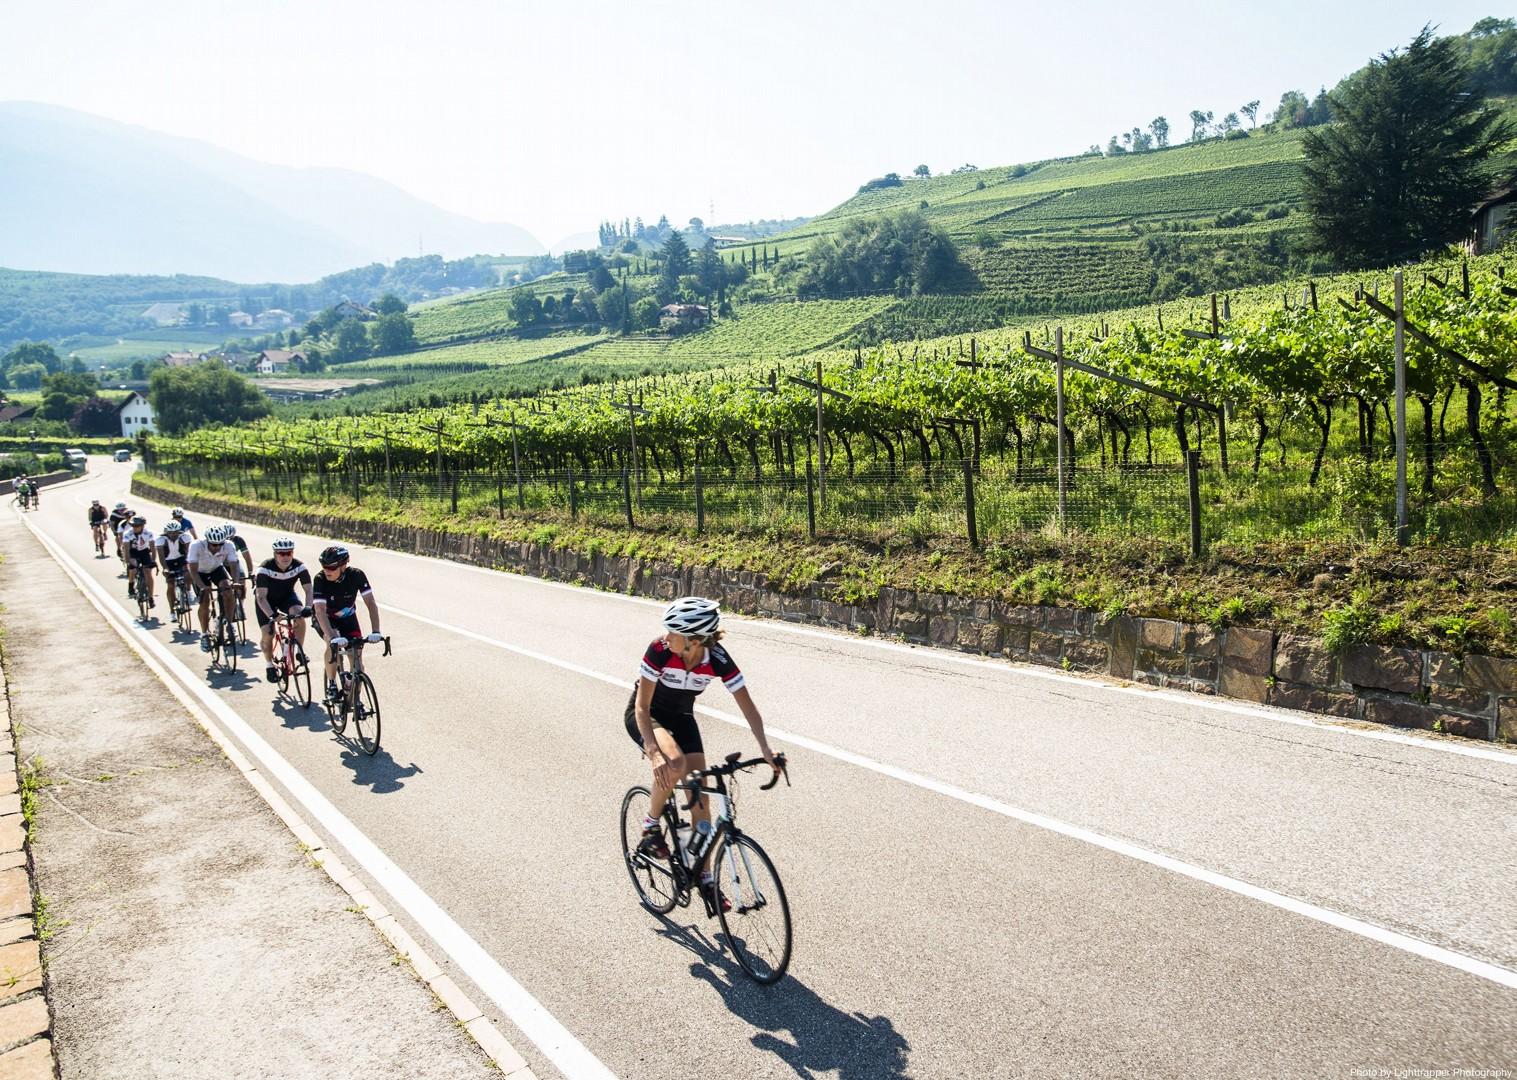 road-cycling-holiday-in-italian-alps.jpg - Italy - Italian Alps Introduction - Guided Road Cycling Holiday - Road Cycling